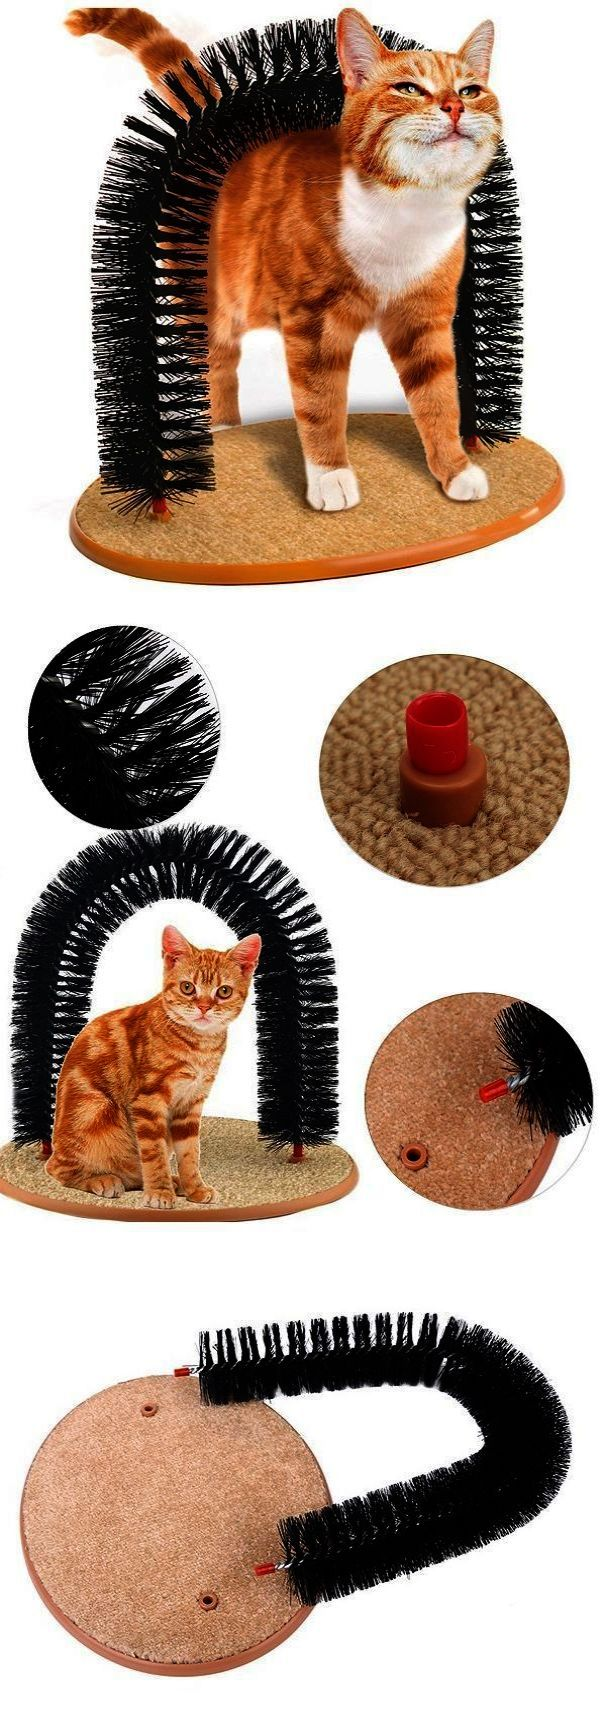 I Ll Be In Goals Homemade Cat Toys Diy Stuffed Animals Diy Cat